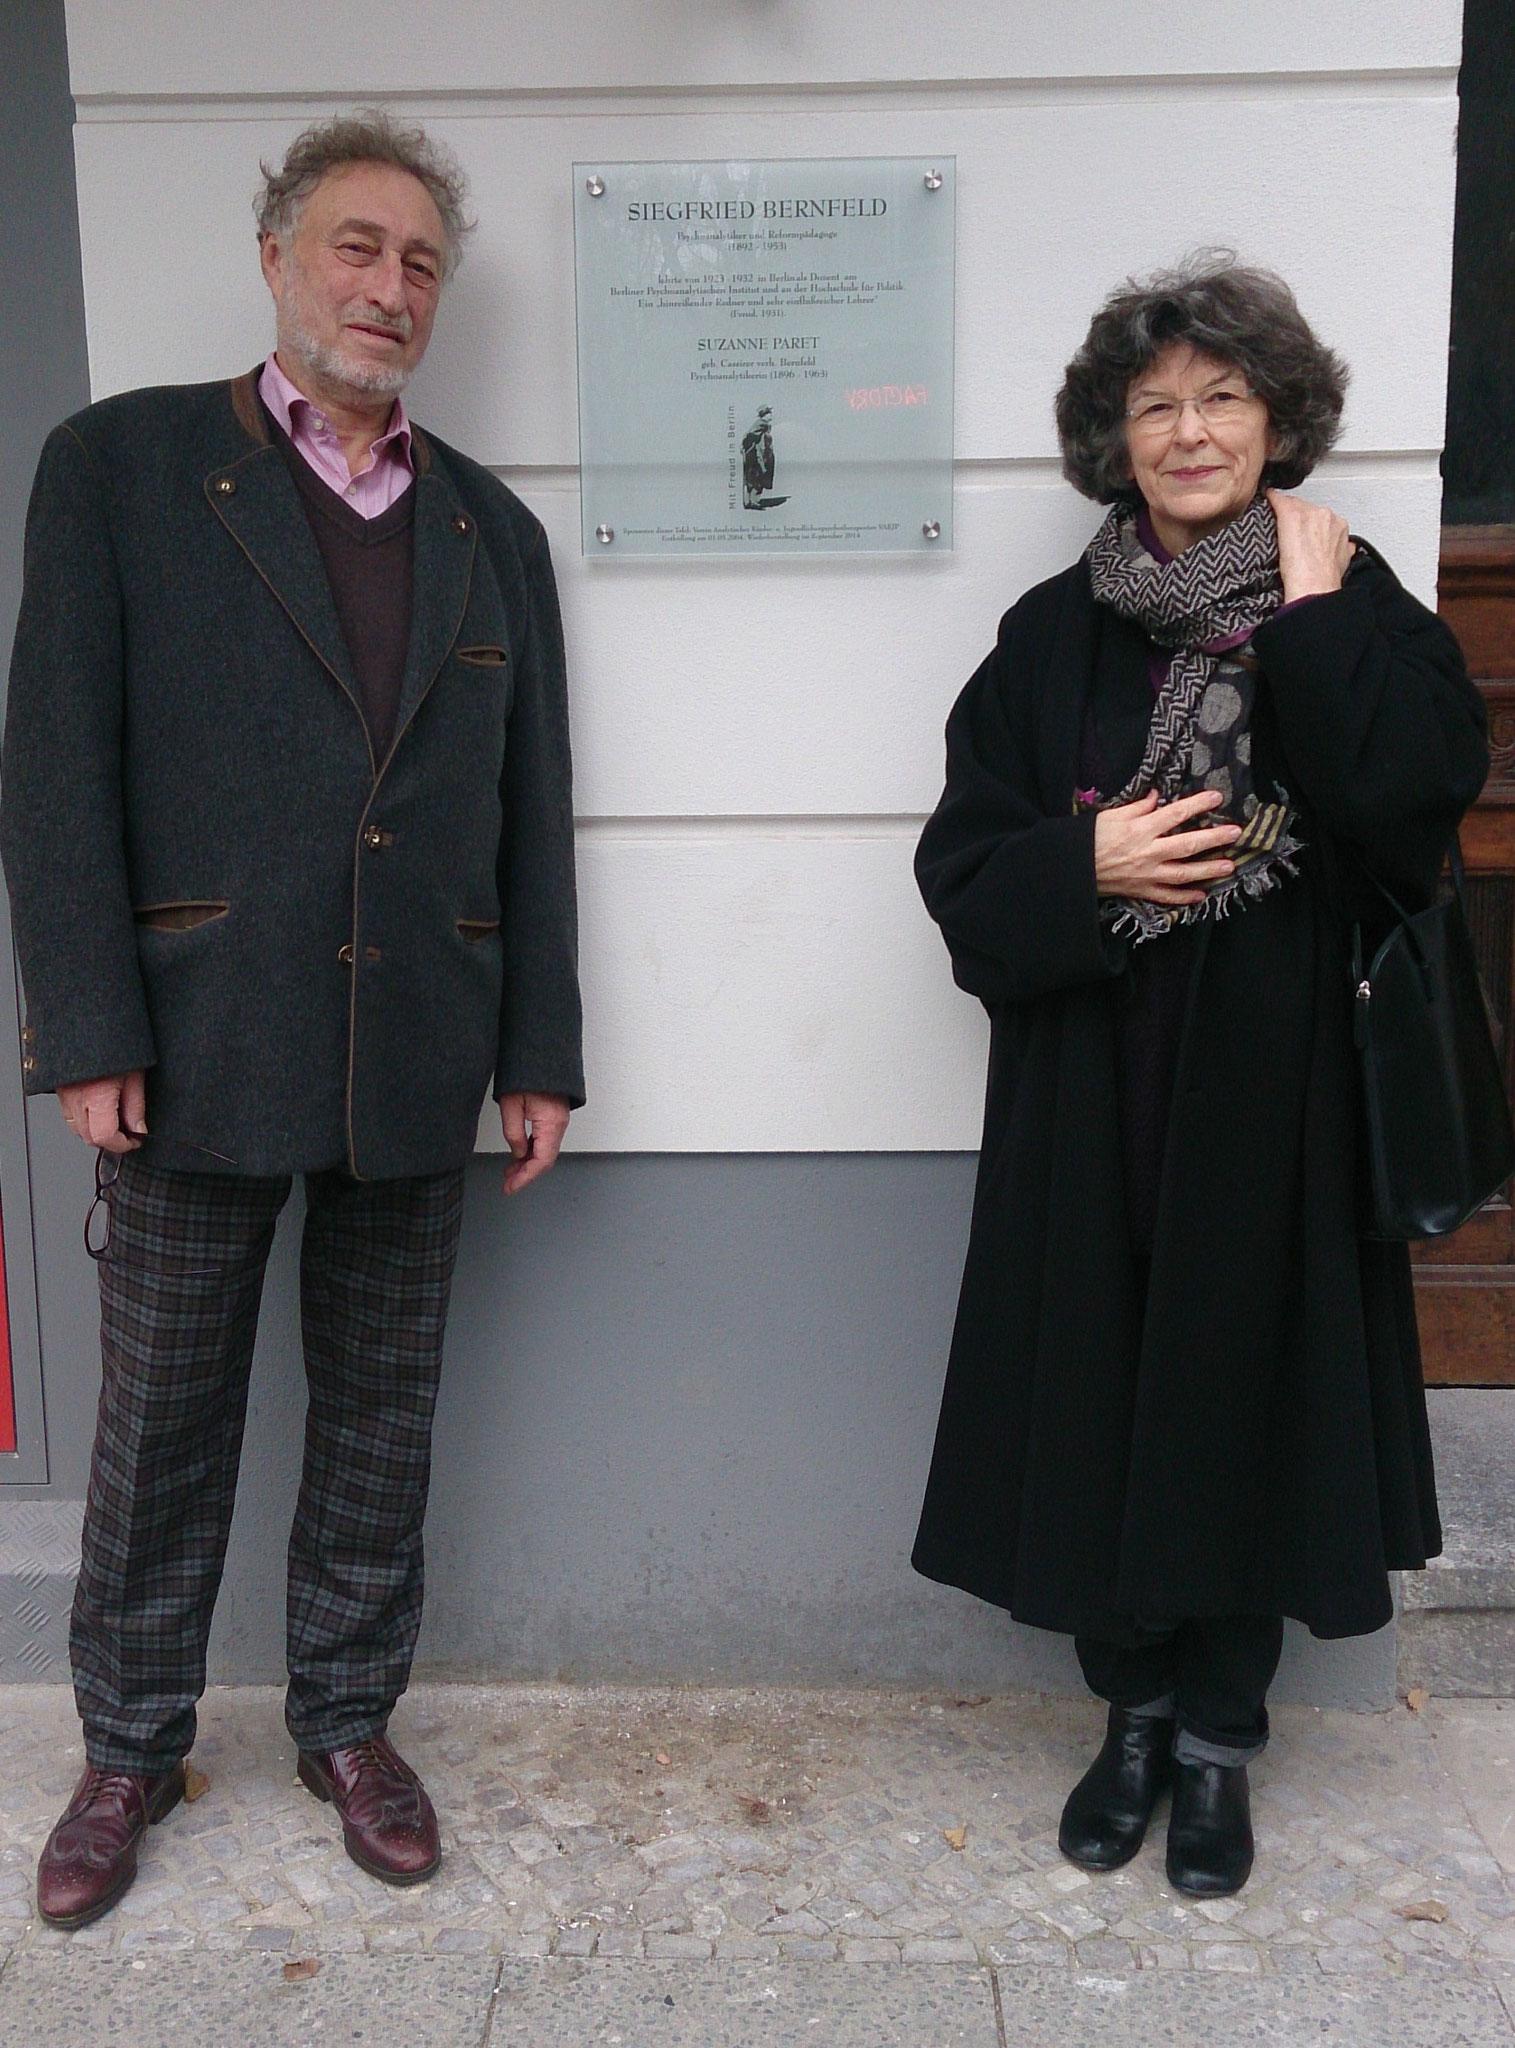 Professor Micha Brumlik, der Pate, und Regine Lockot